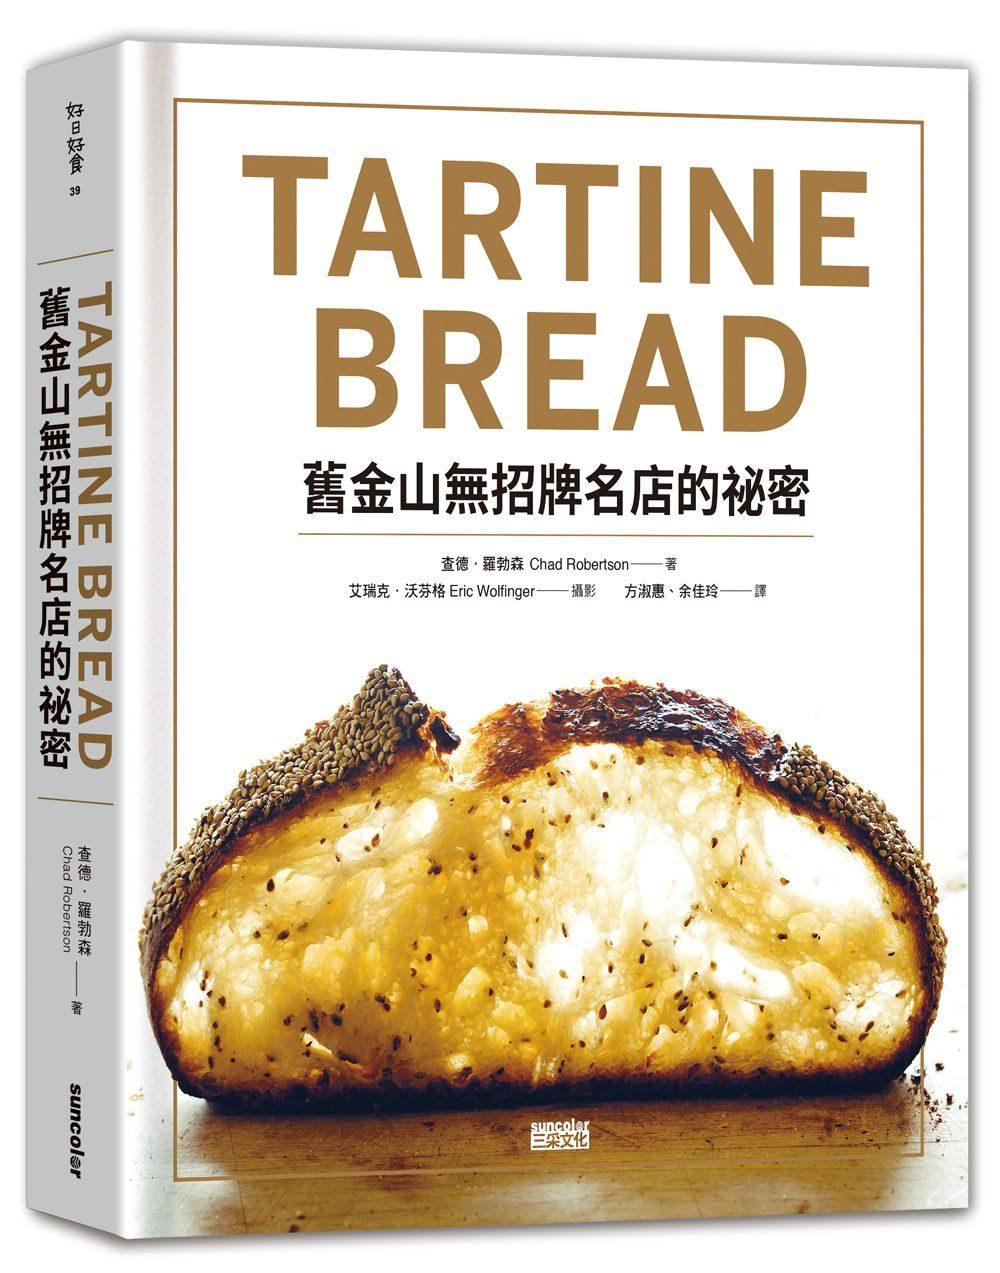 TARTINE BREAD:舊金山無招牌名店的祕密 '17